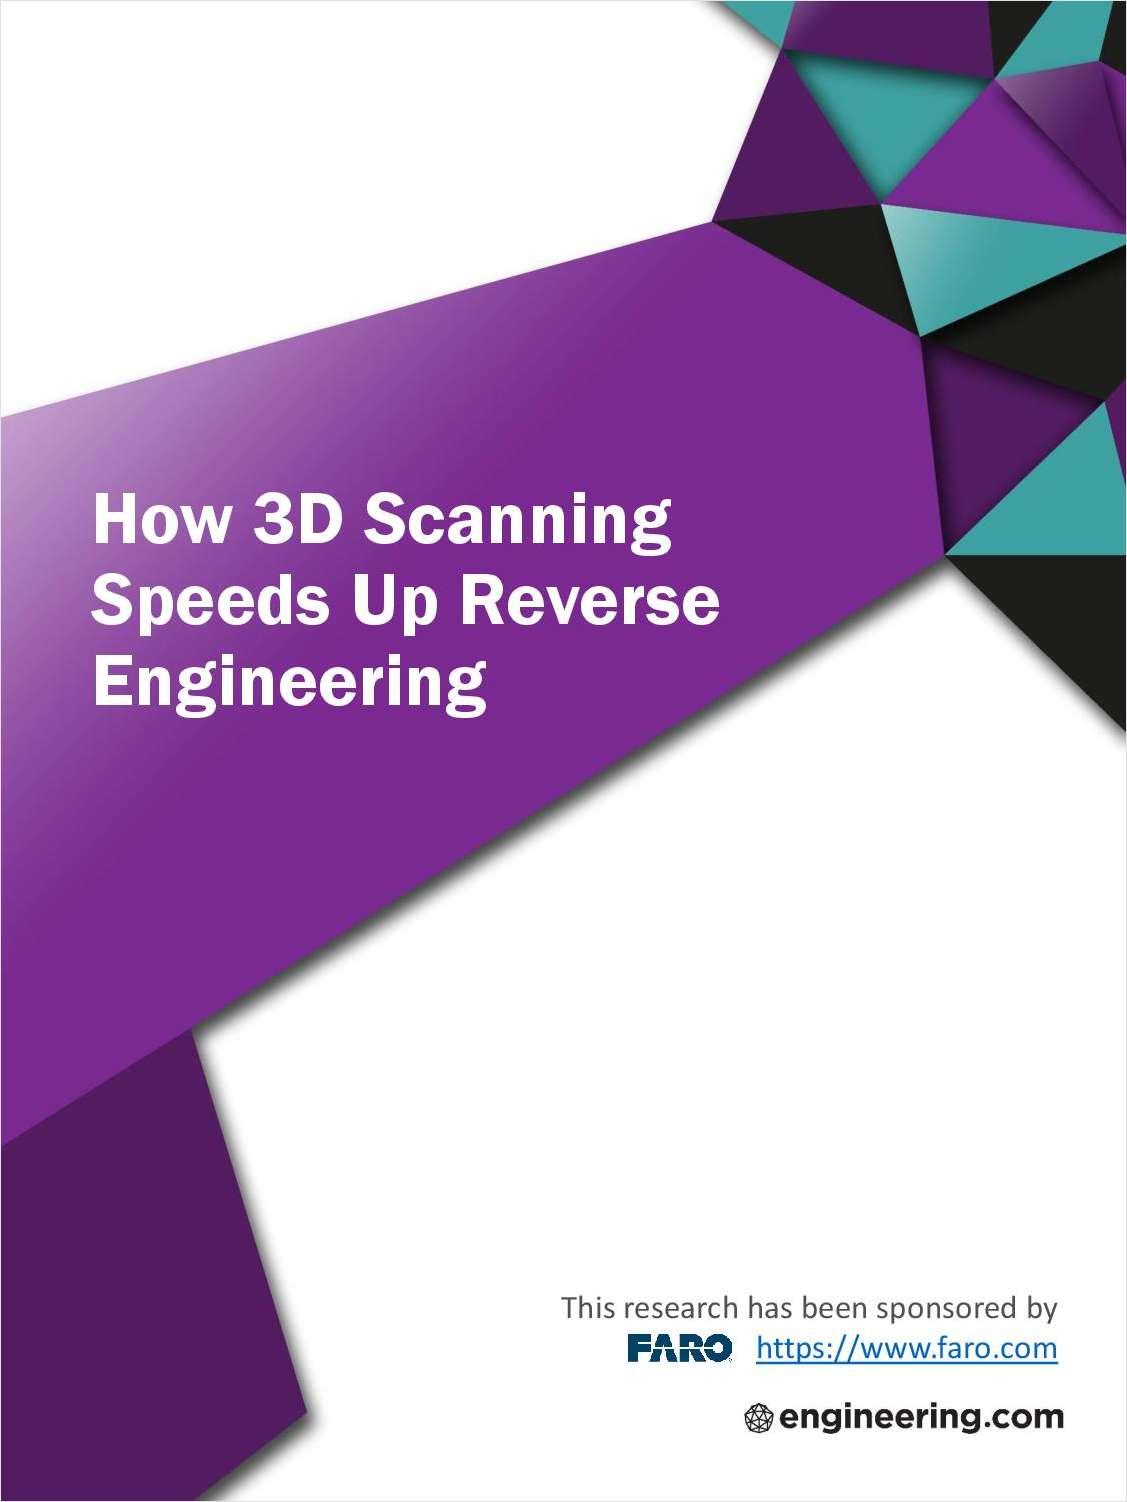 How 3D Scanning Speeds Up Reverse Engineering